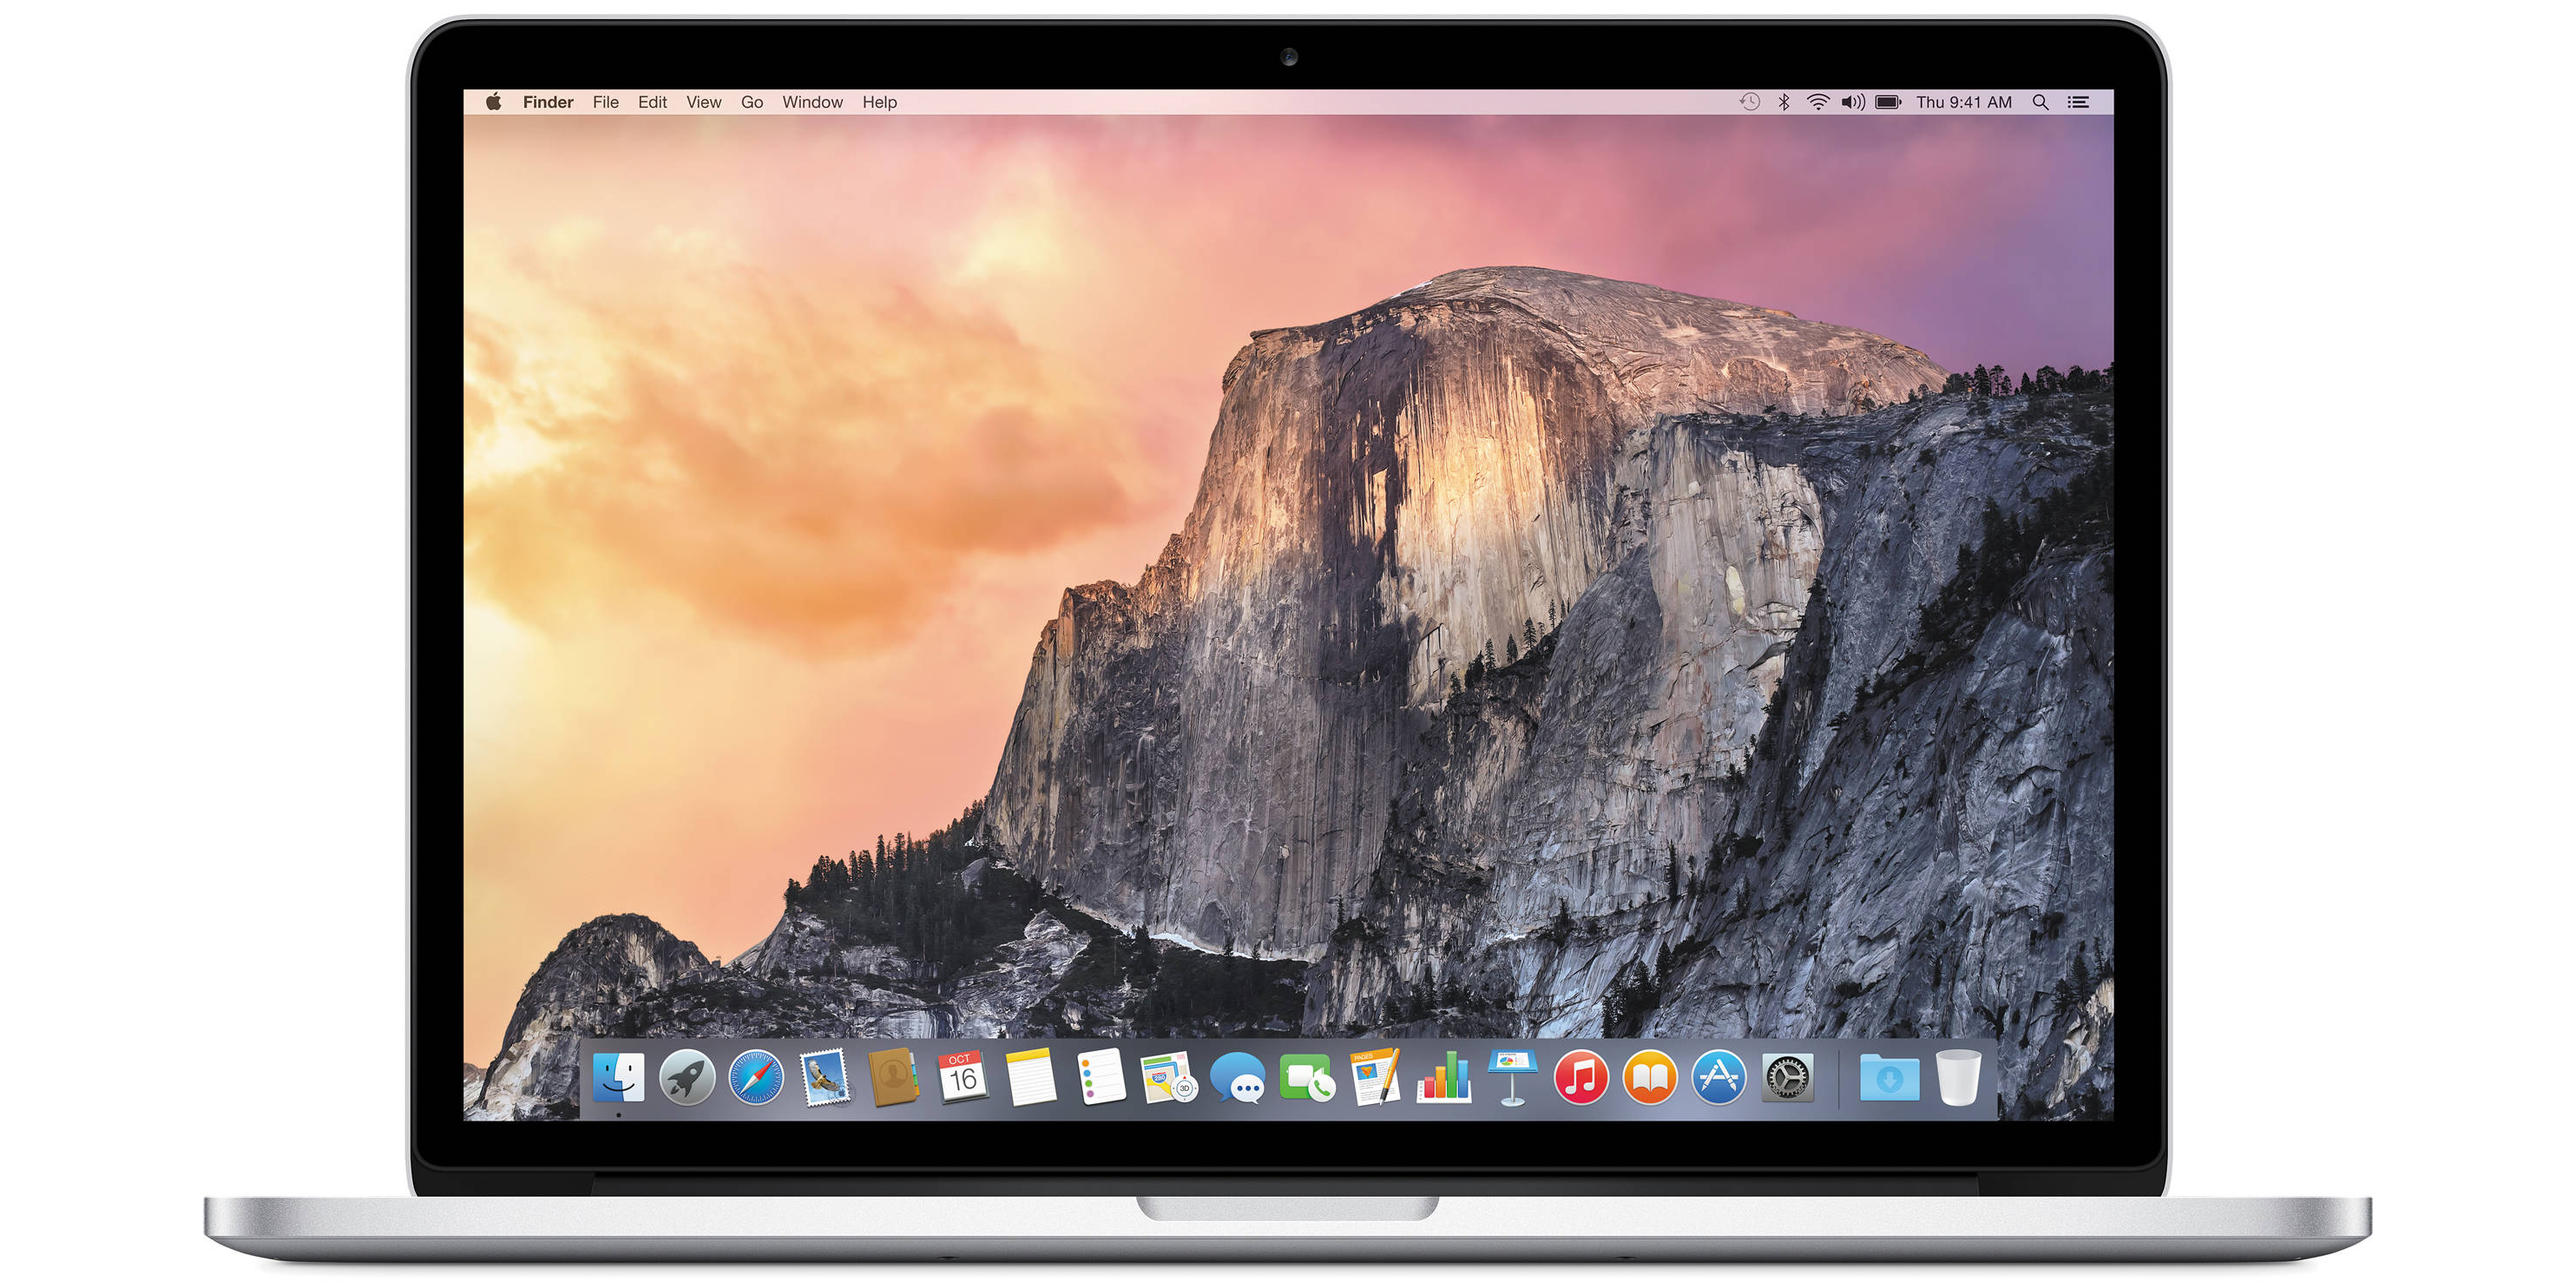 apple_mjlt2ll_a_15_4_macbook_pro (1)